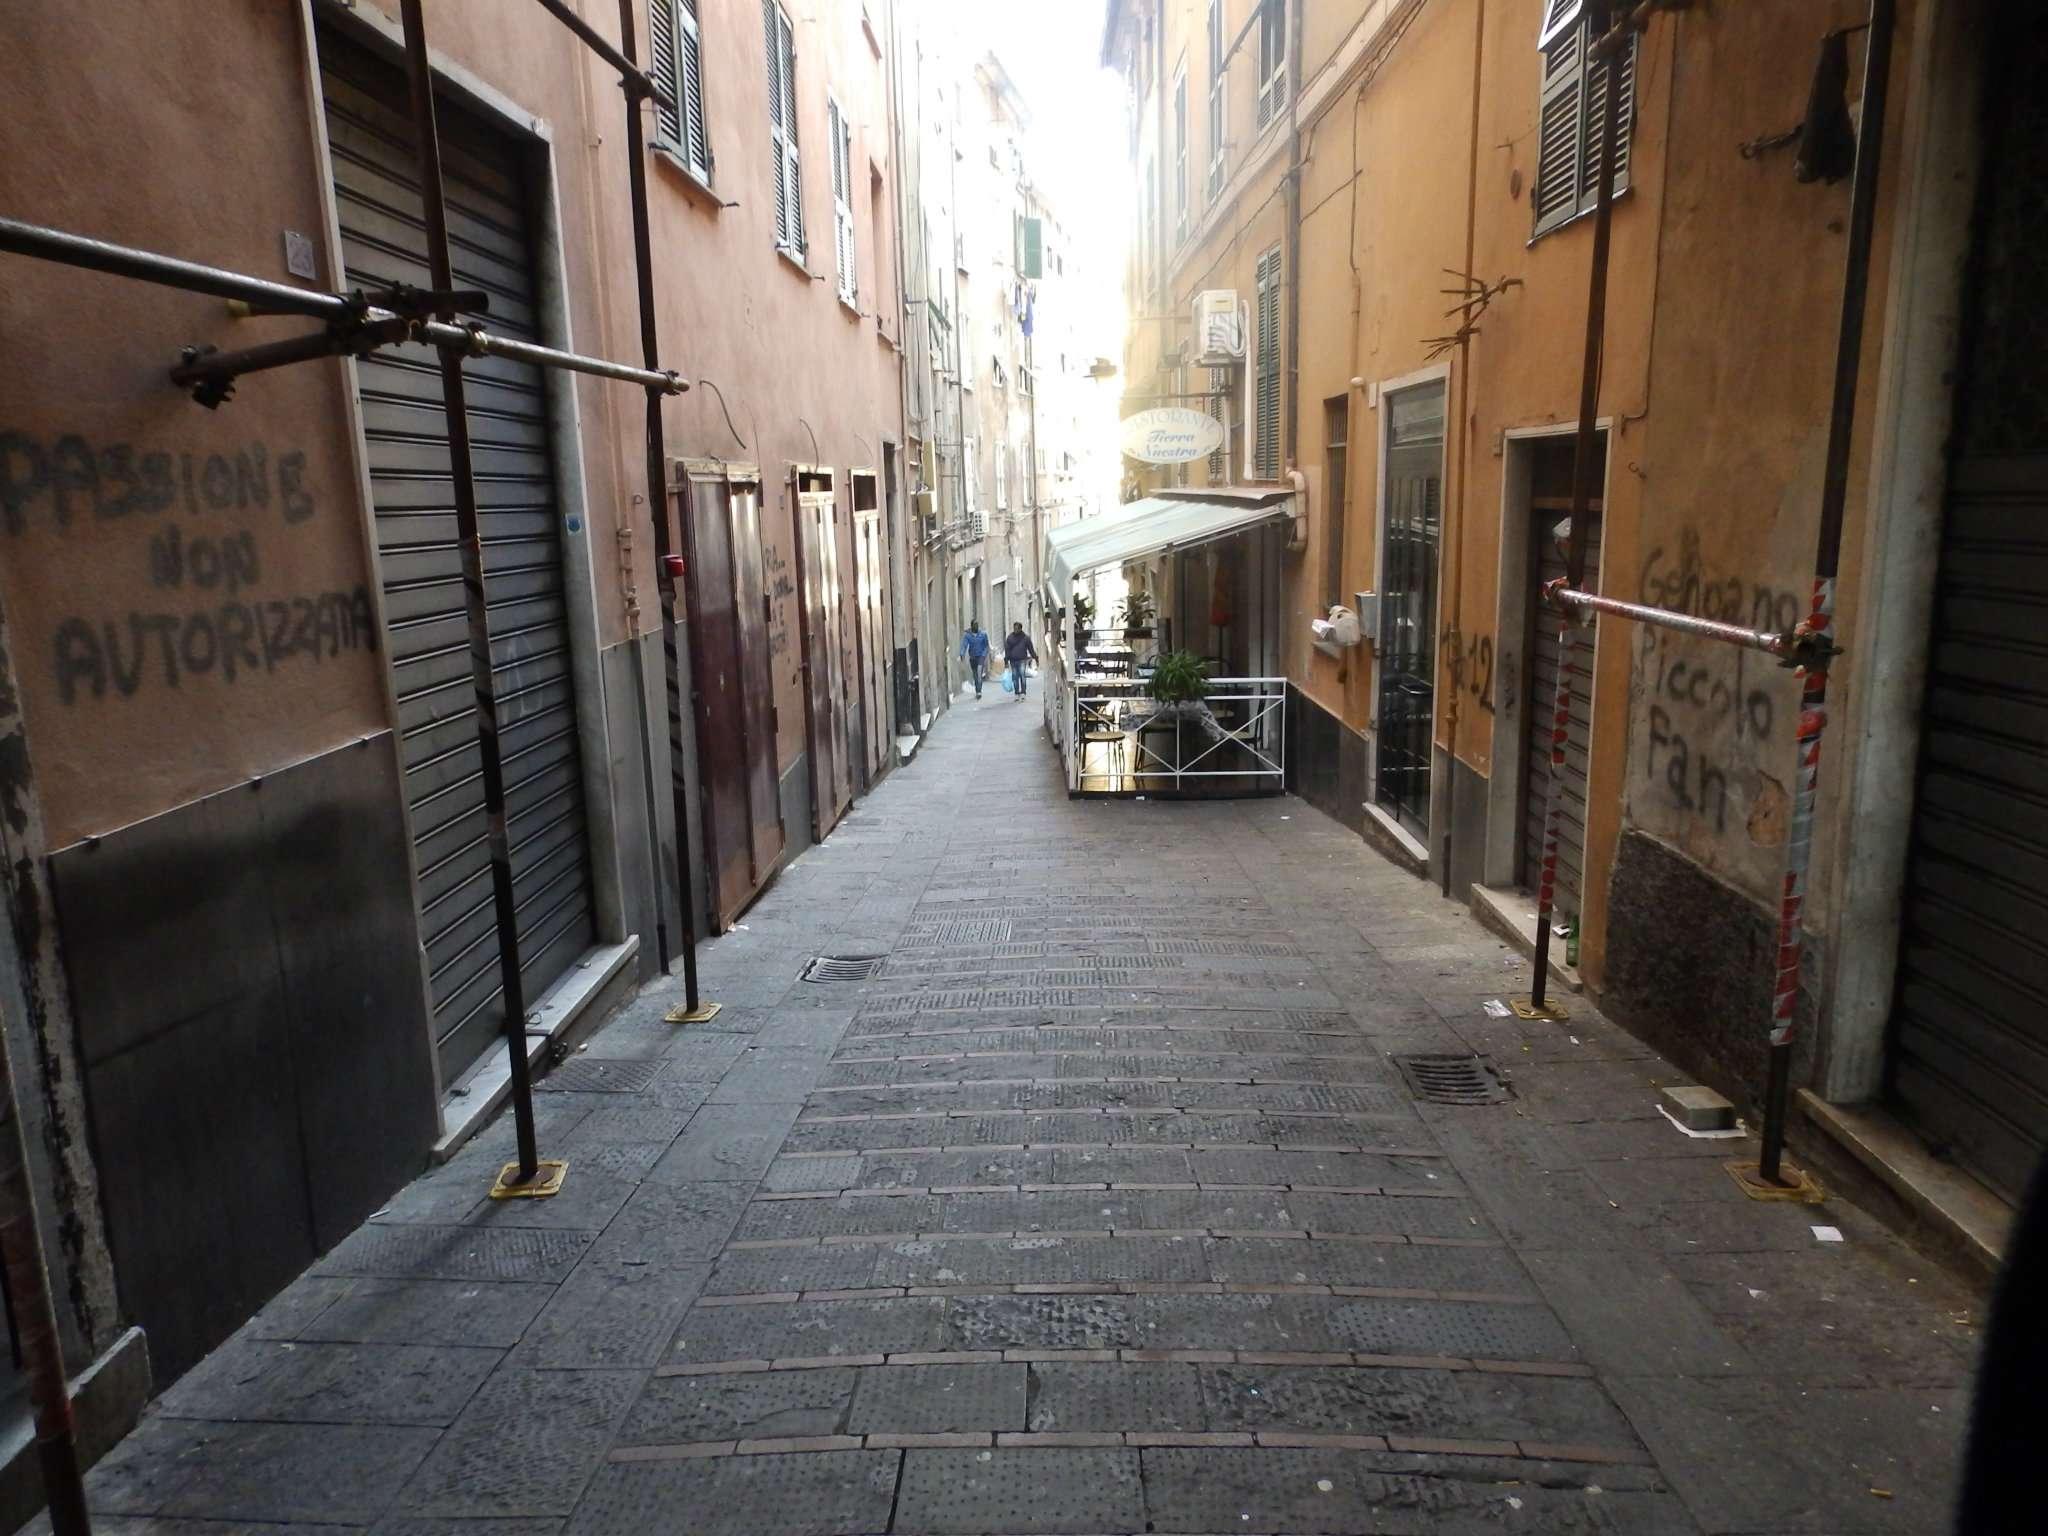 Bilocale Genova Salita San Paolo 7